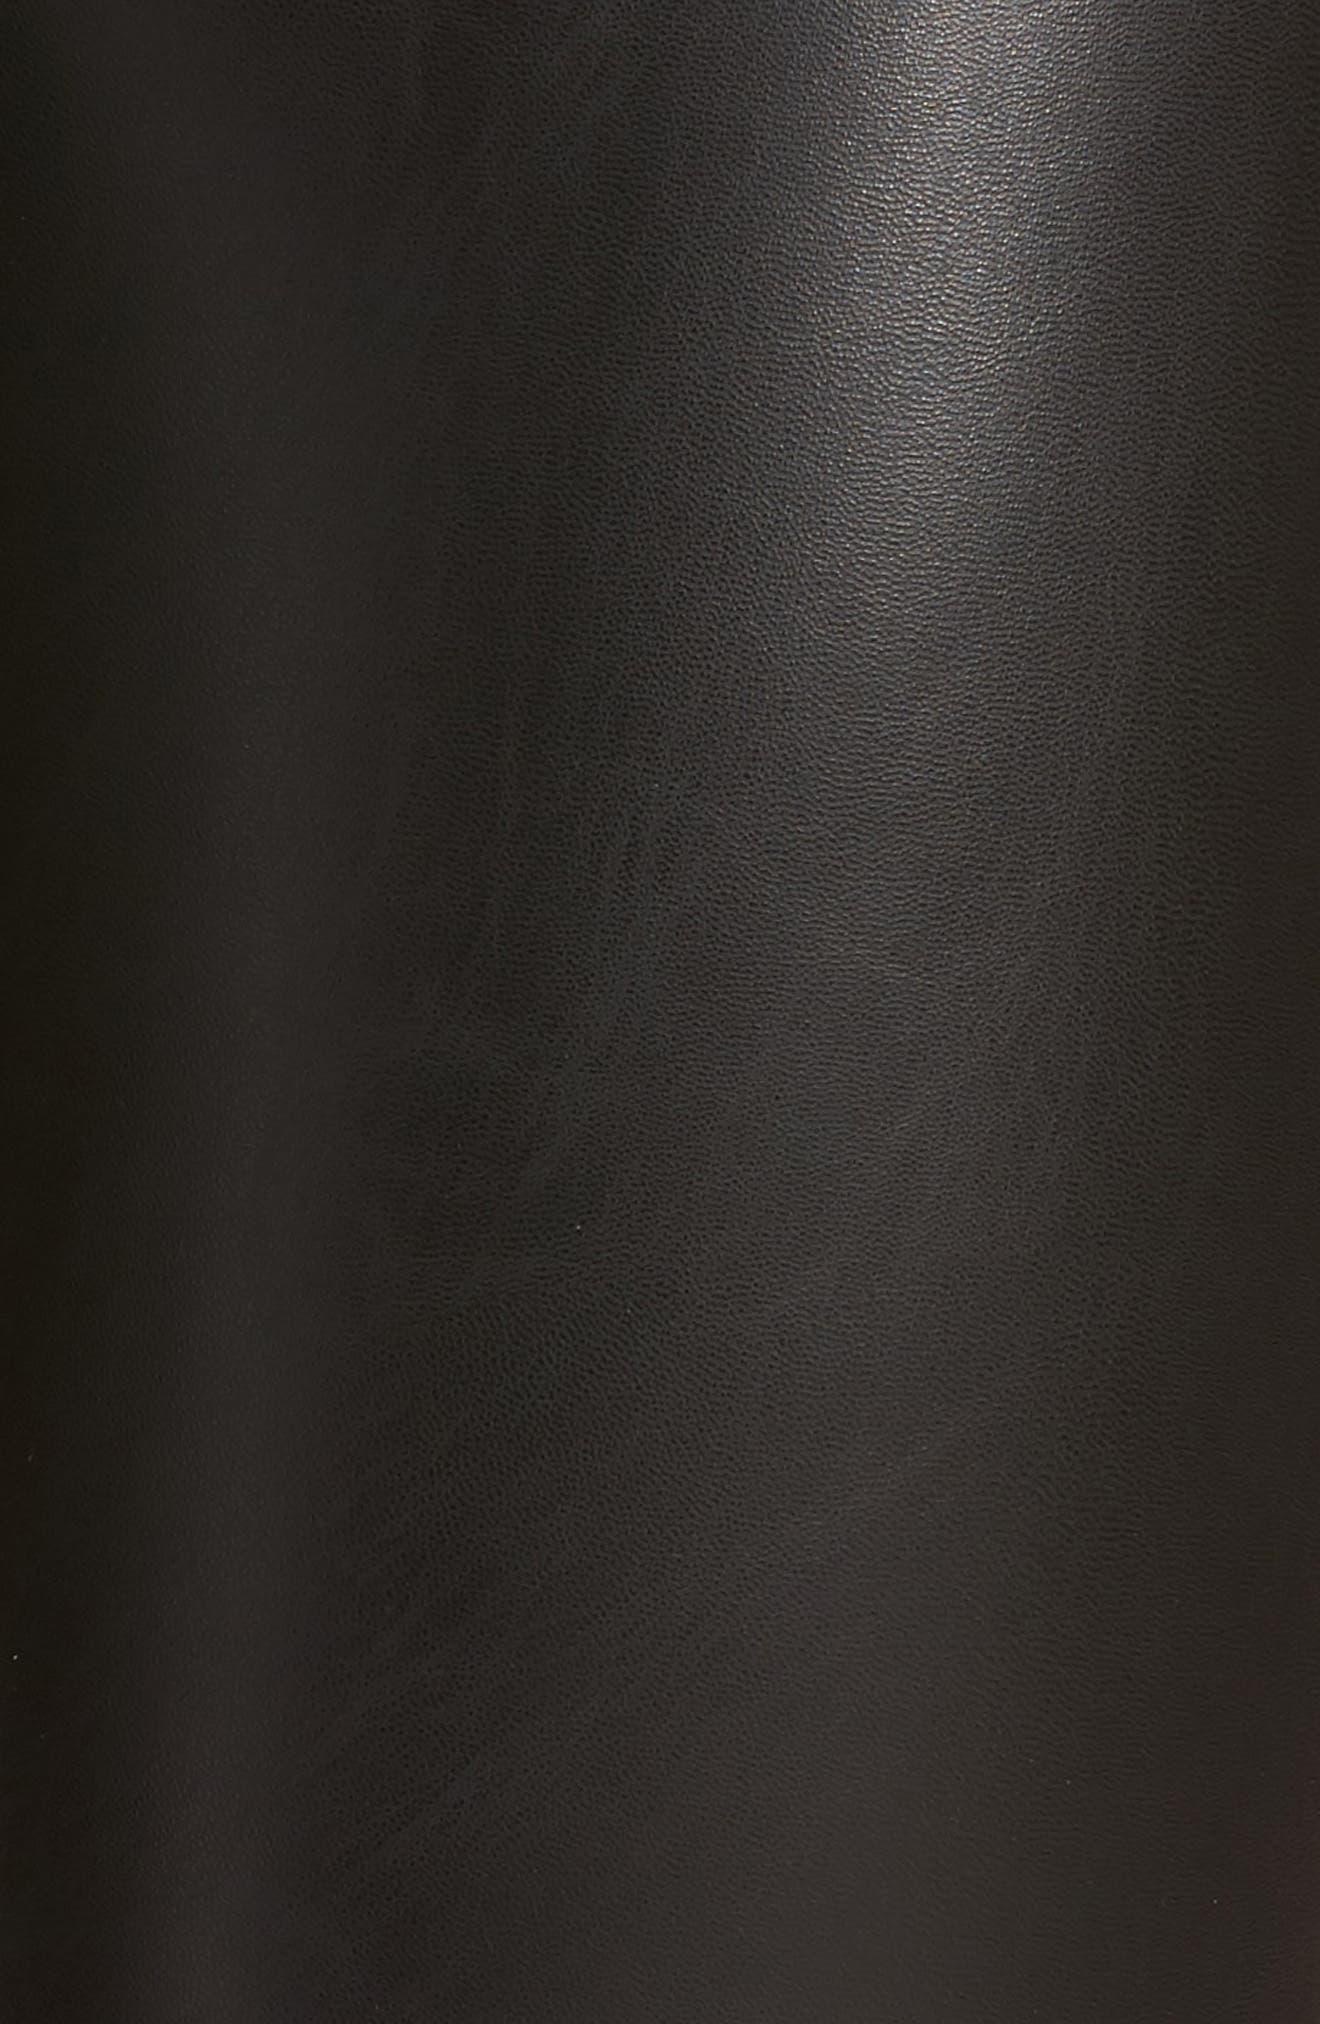 Elliot High Waist Faux Leather Leggings,                             Alternate thumbnail 5, color,                             001